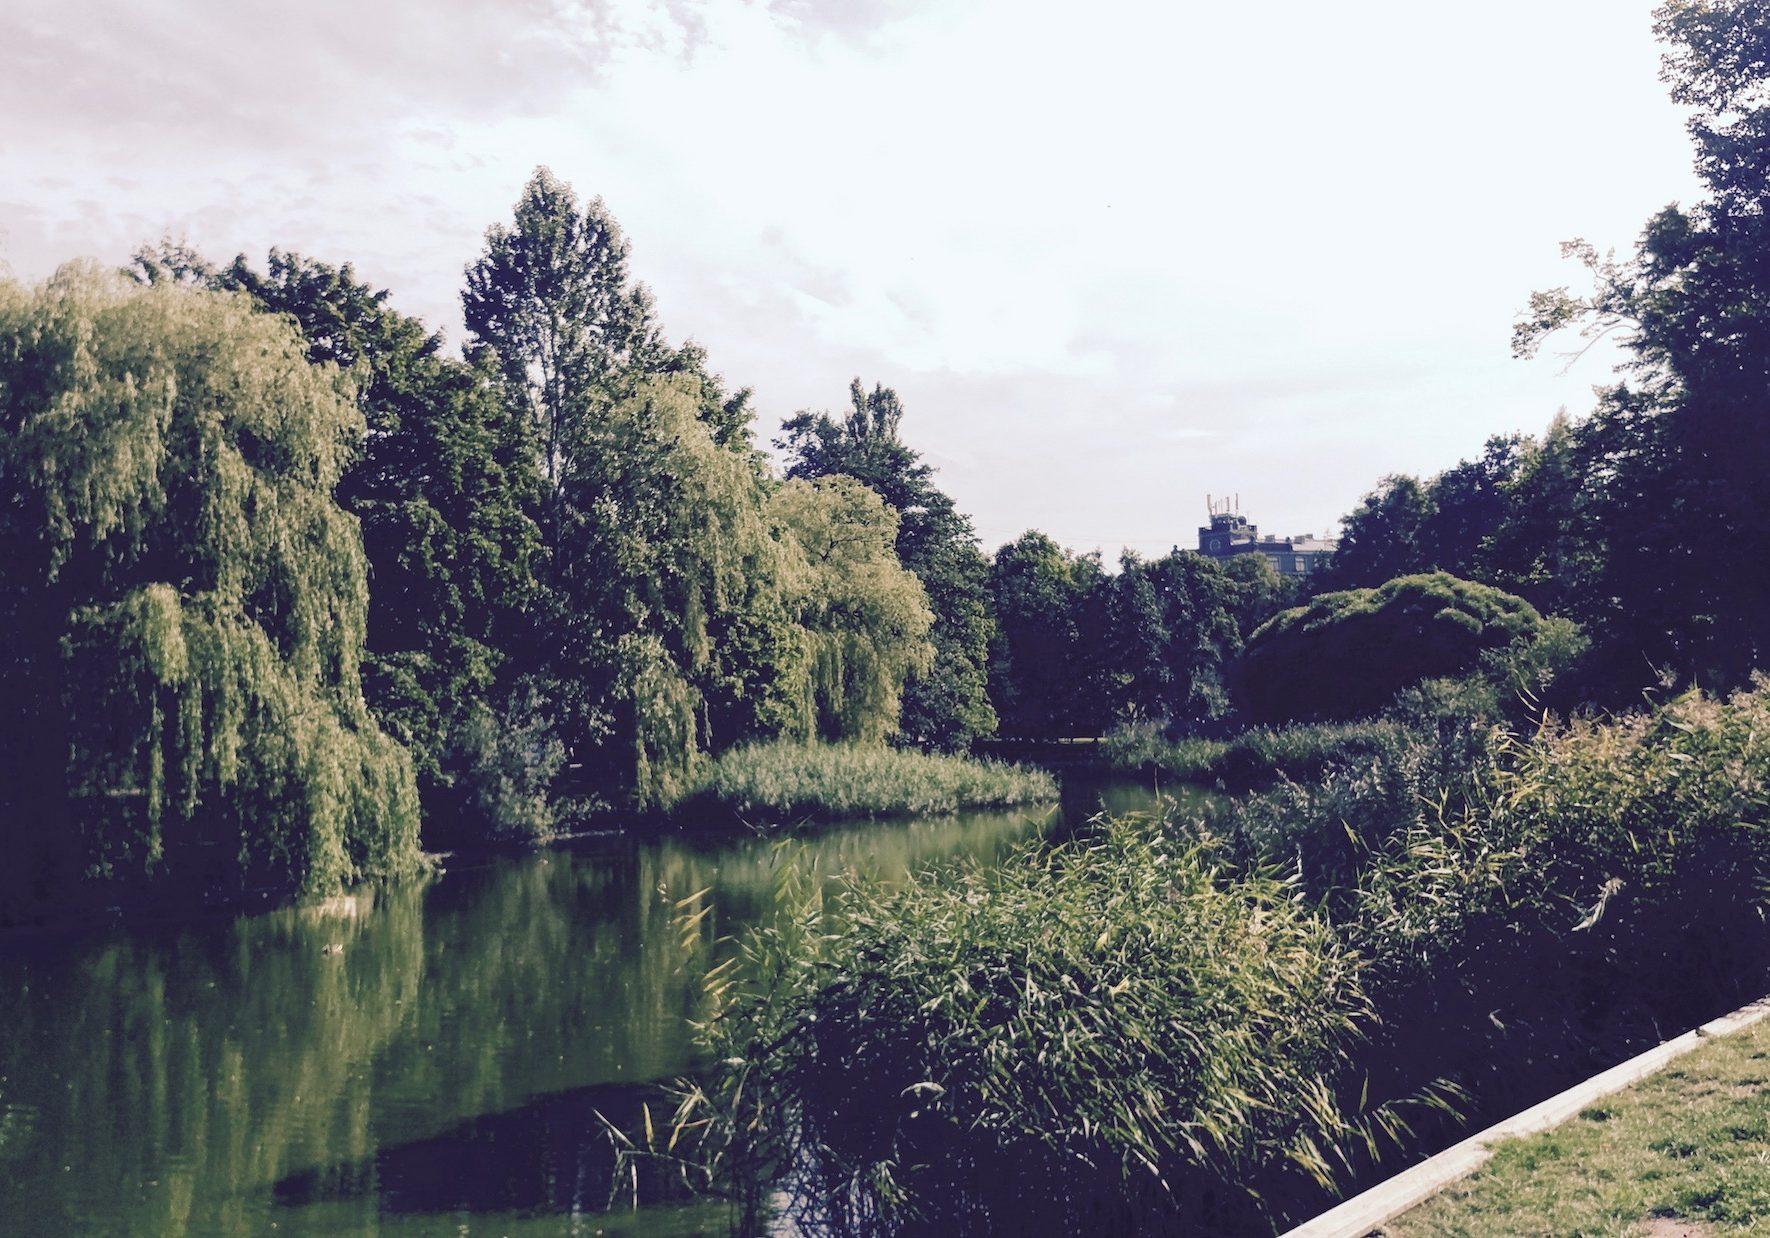 Pond in Viesturdārzs